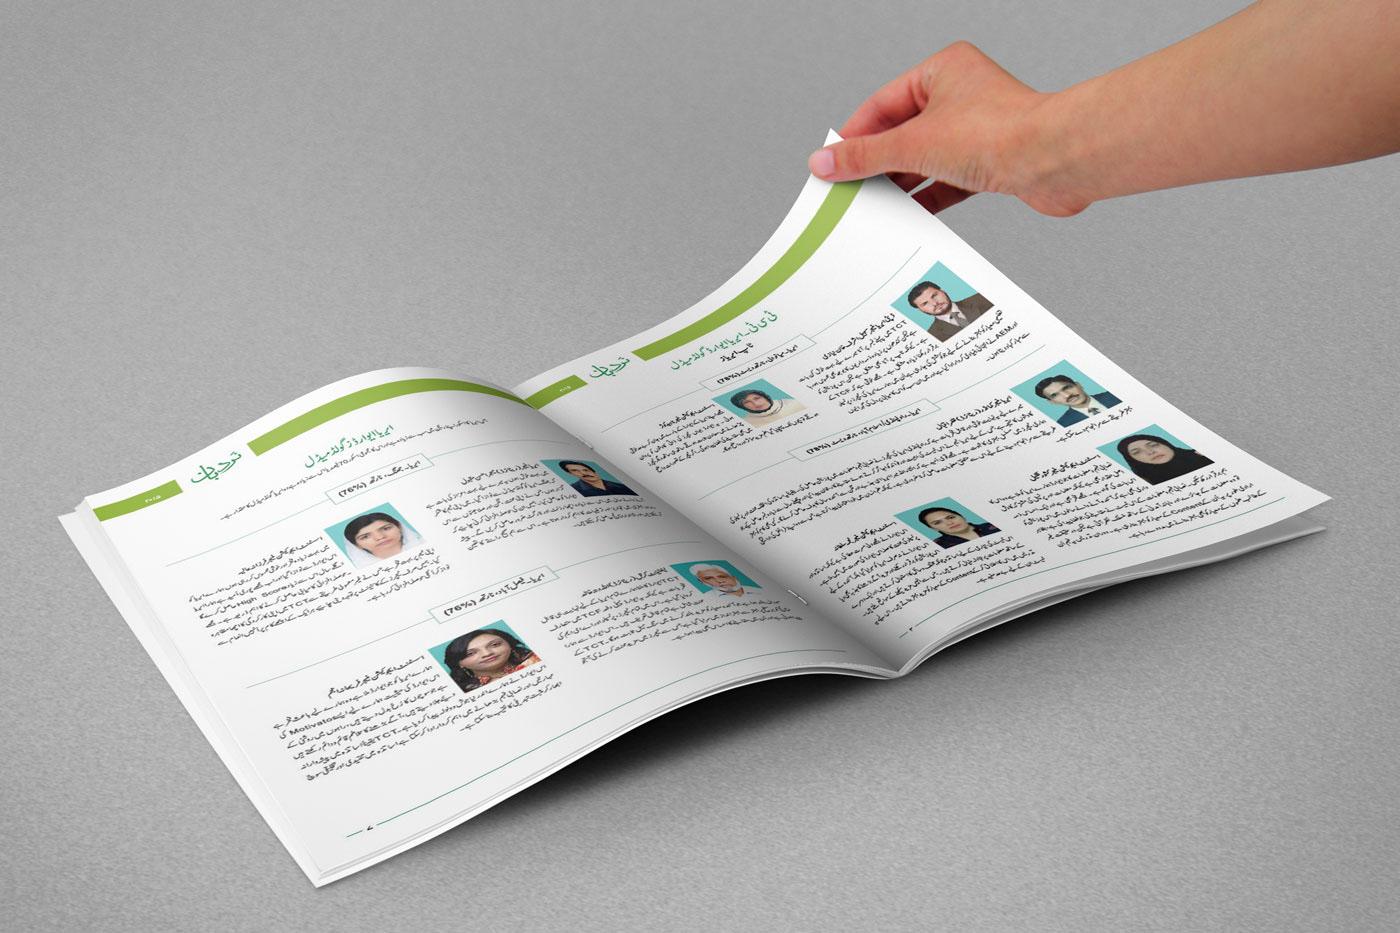 graphic design magazine TCF citizen foundation print school brand